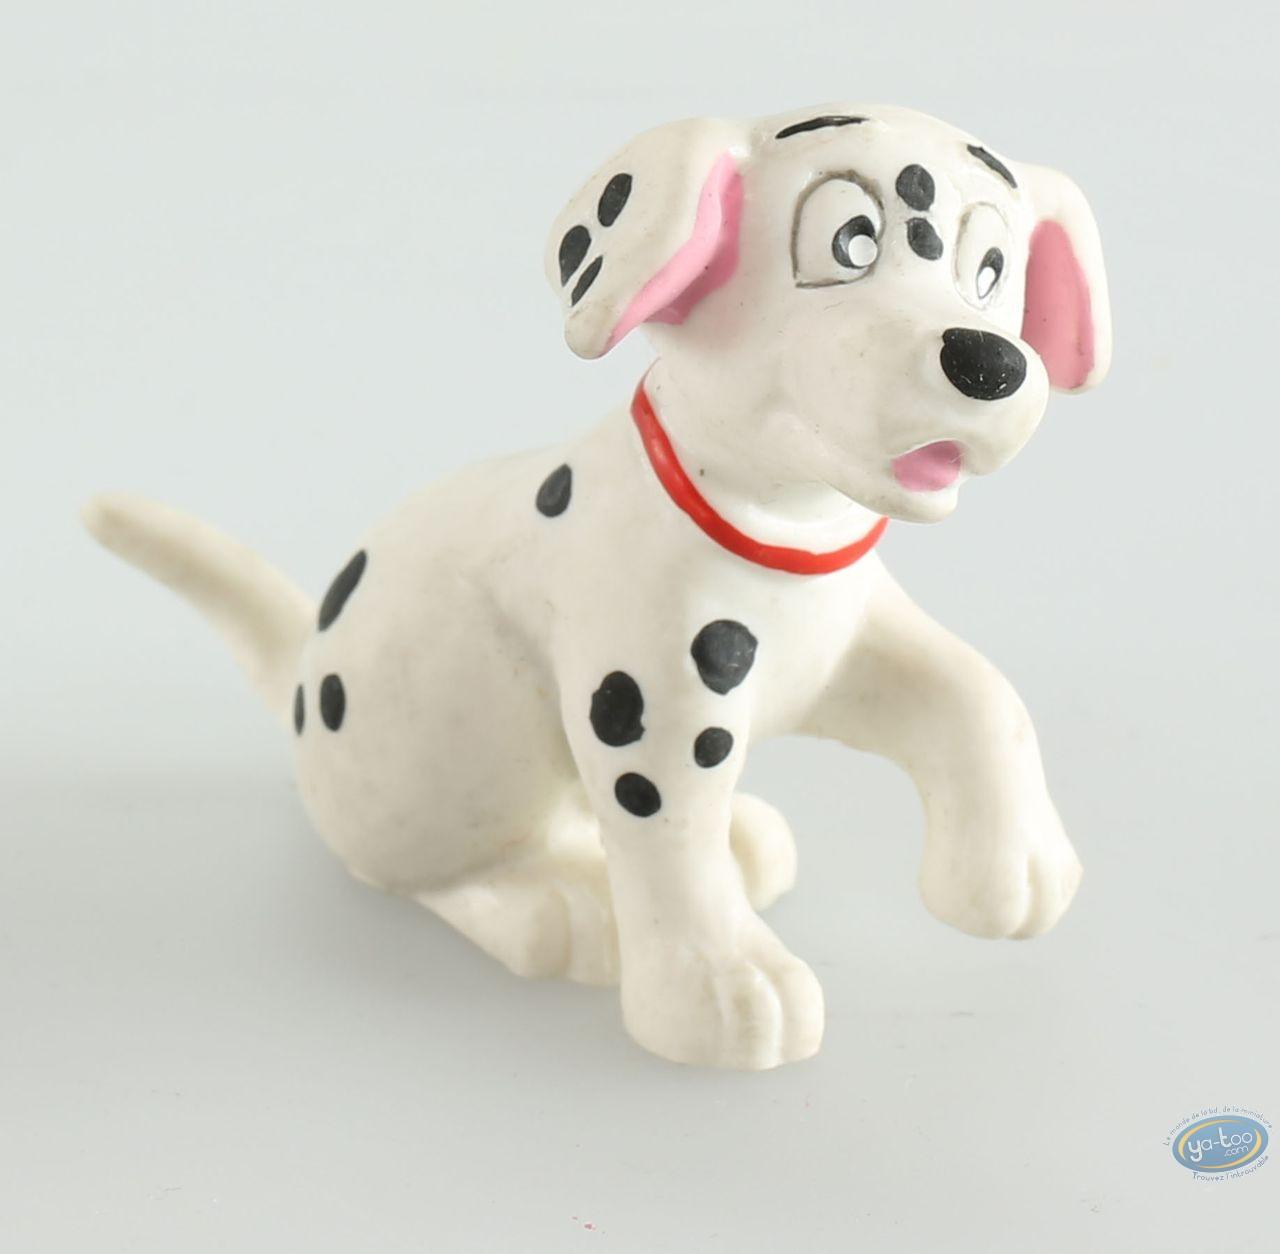 Plastic Figurine, 101 Dalmatians (The) : Rolly, Disney